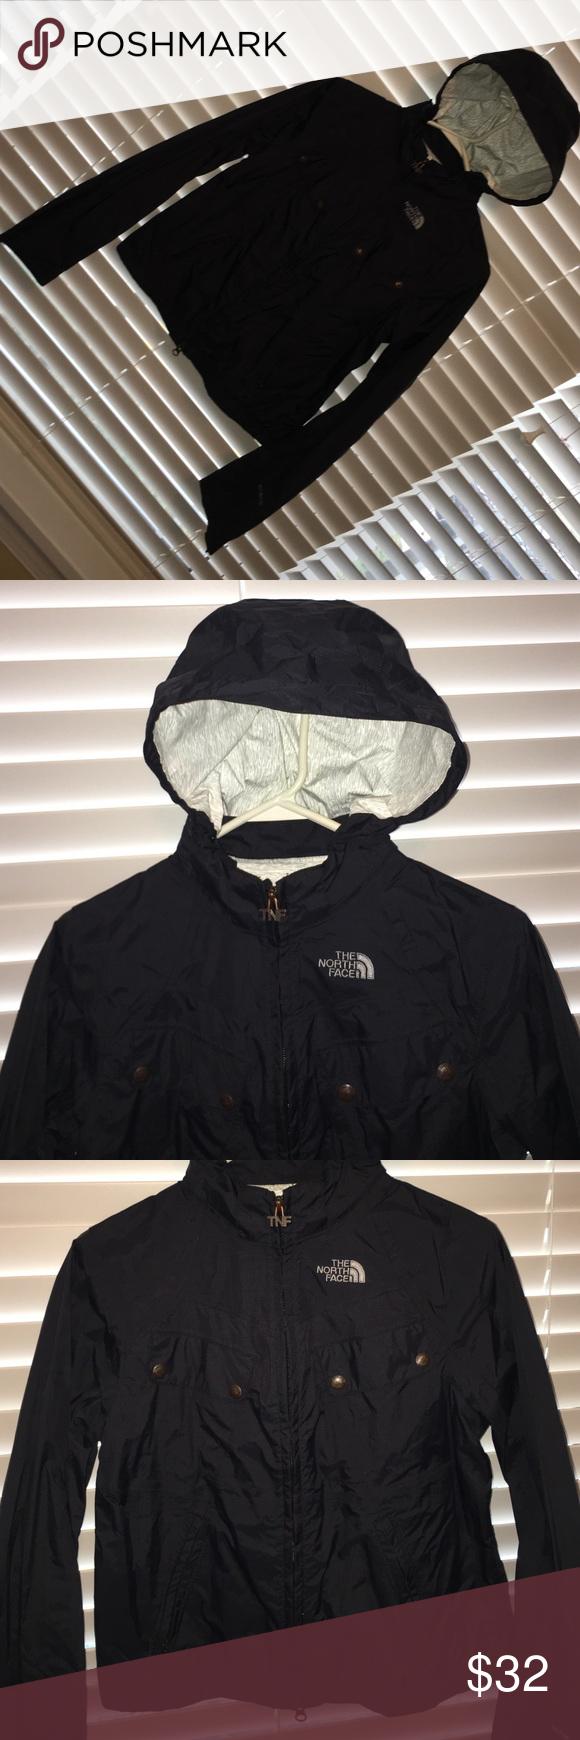 The North Face rain coat w/ detachable hood size S THe North Face Size S/P, Black, detachable hood, zipper pockets, button front pockets. Hip length North Face Jackets & Coats